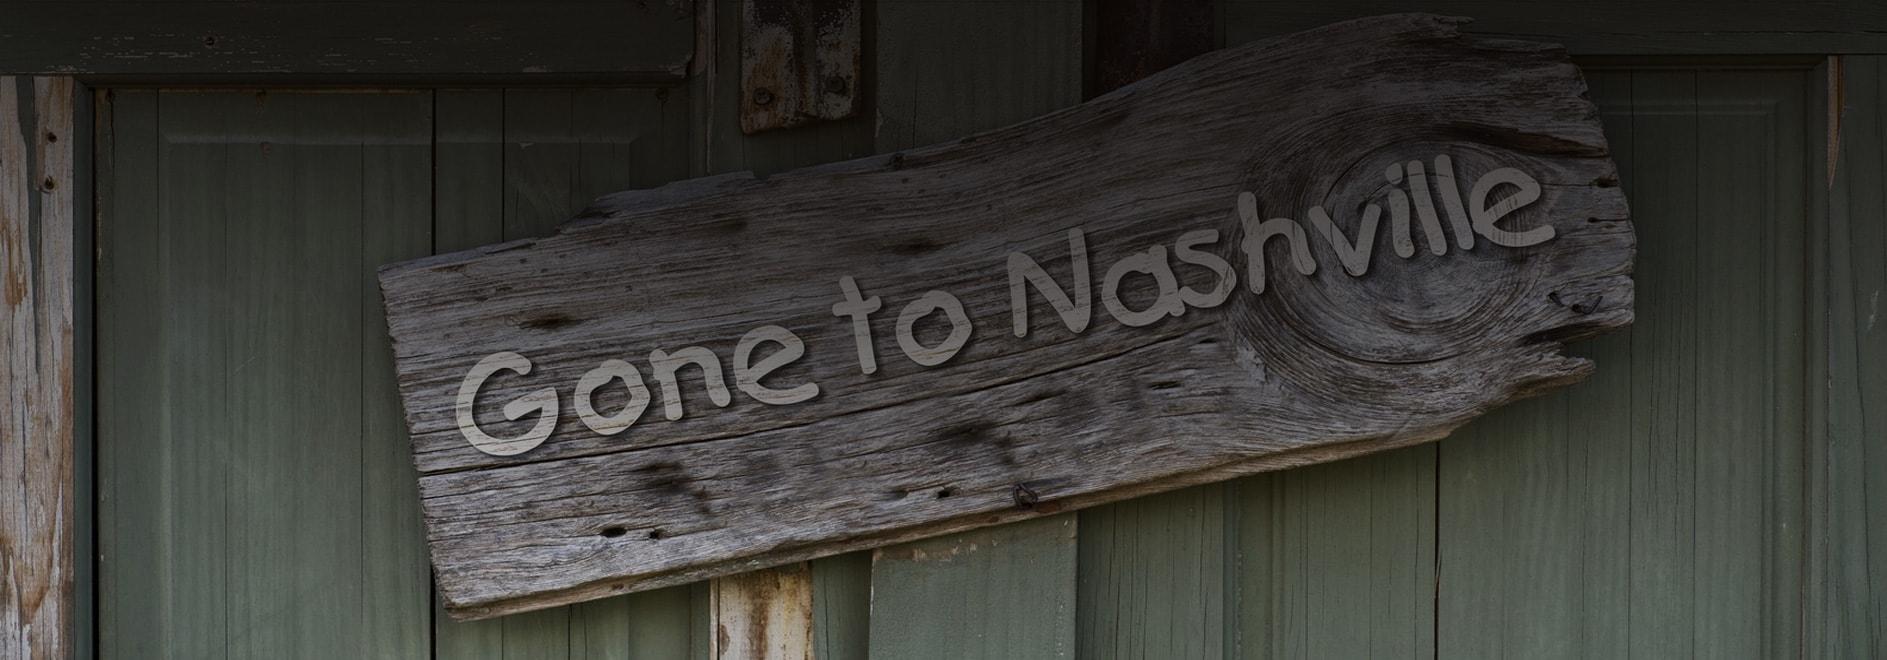 Web Design Nashville Tennessee